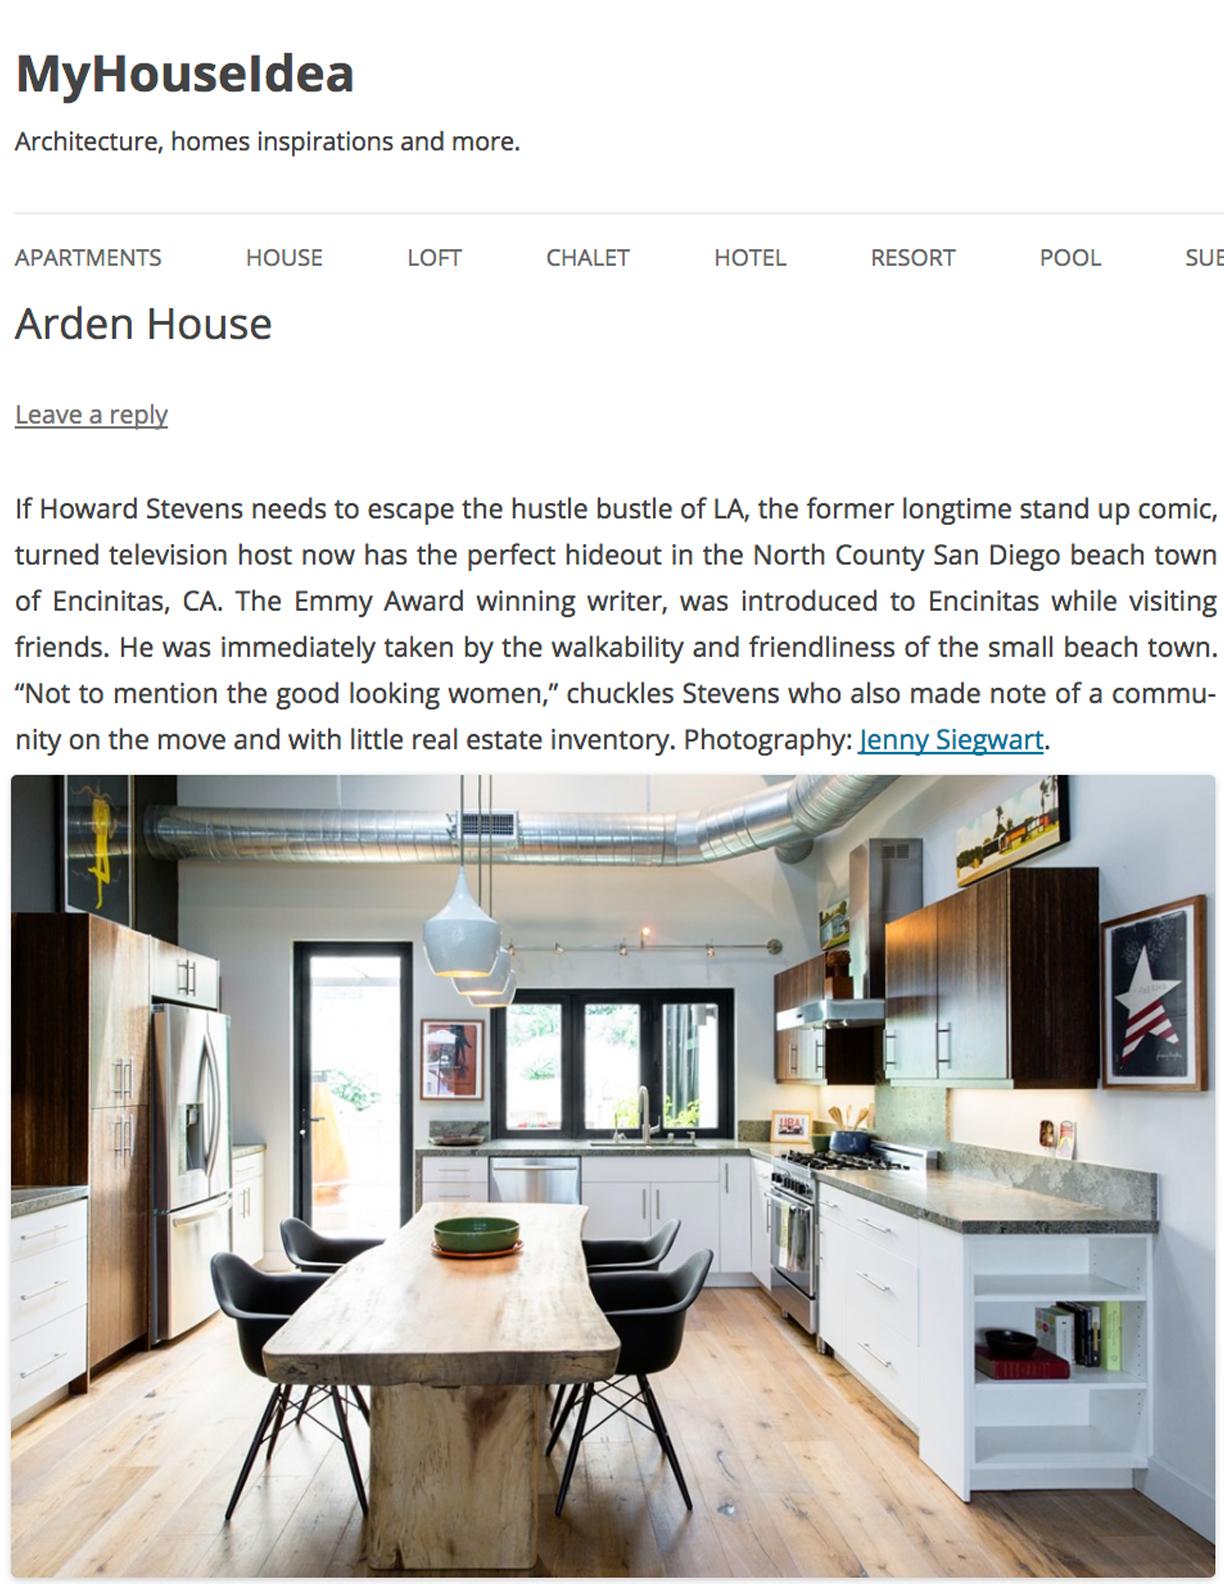 MYHOUSEIDEA   NOVEMBER 16, 2017  Arden House. Television Host's LA Escape.